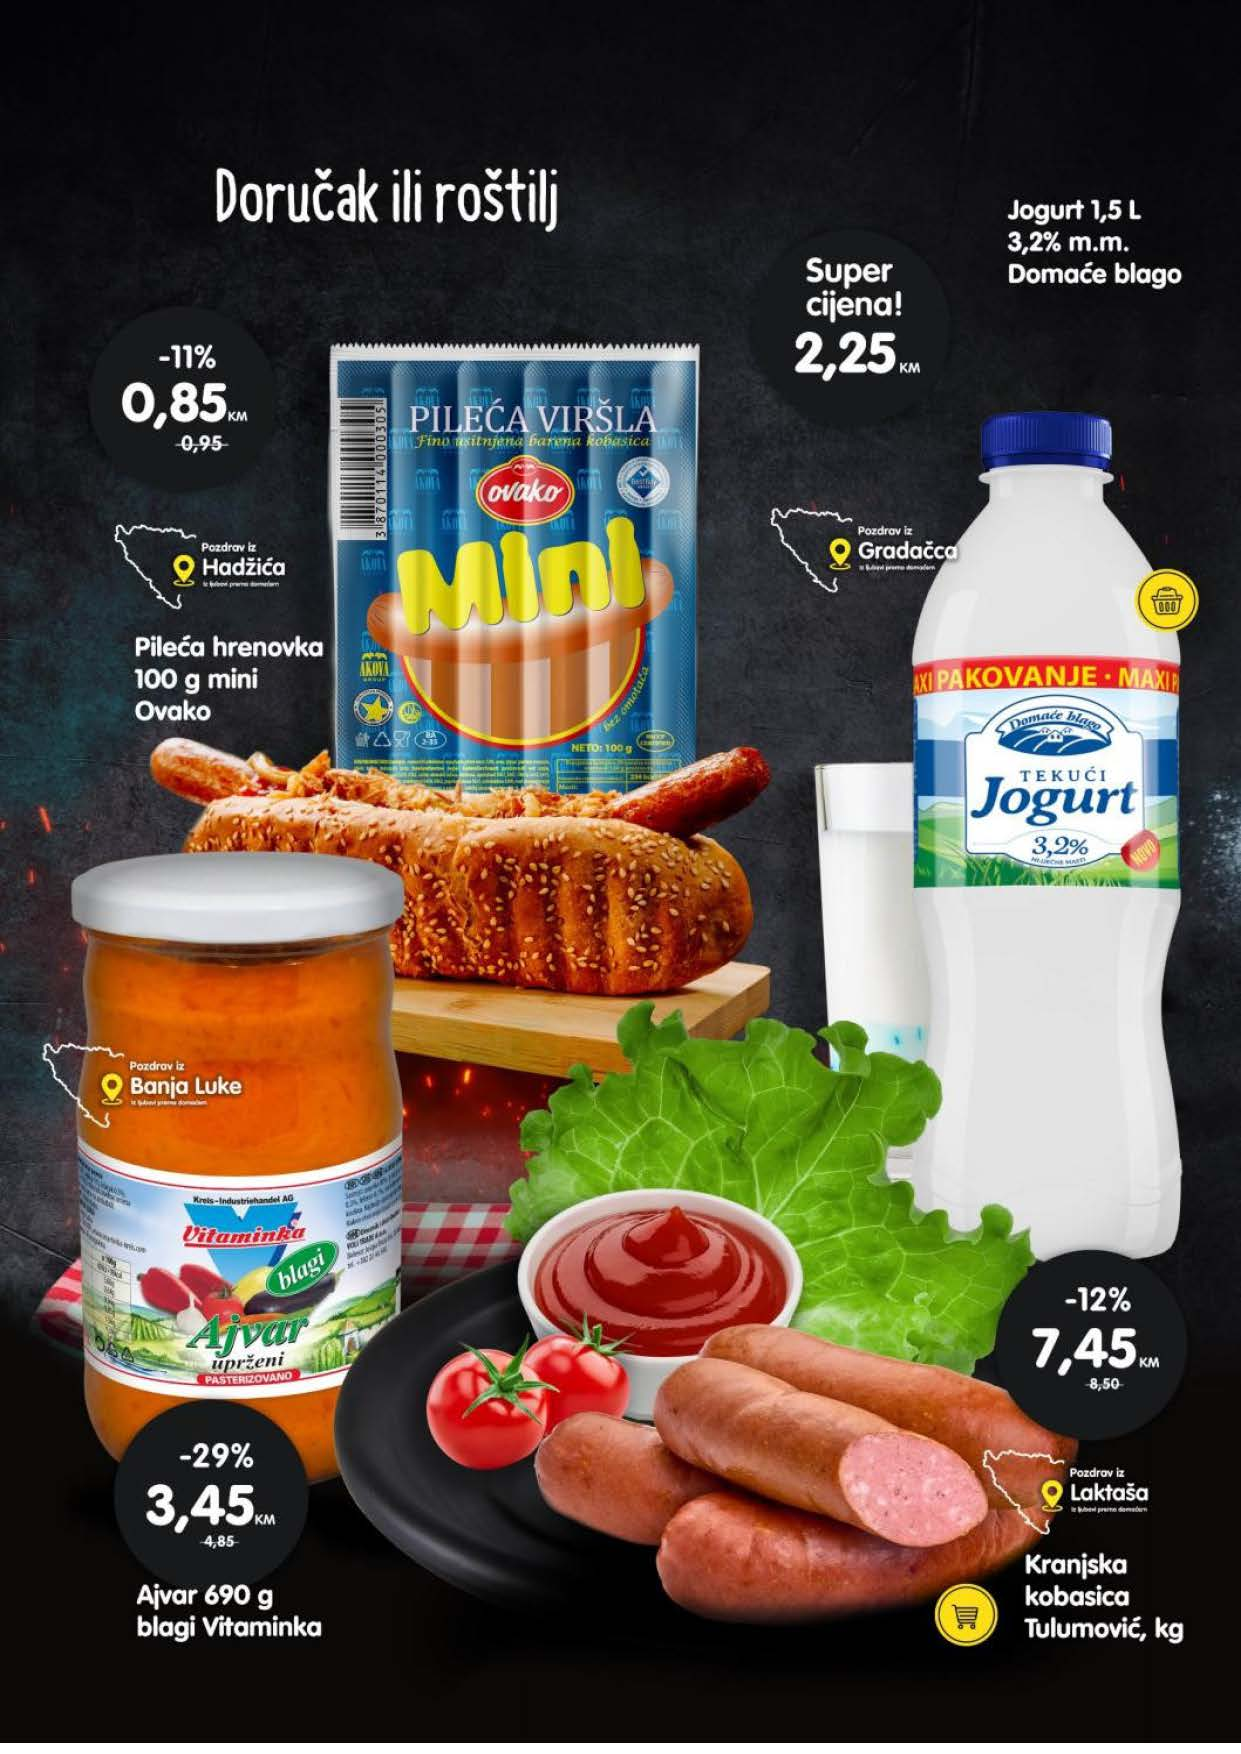 BINGO Katalog AKCIJA Kupuj pametno kupuj domace JUN 2021 31.05.2021. 06.06.2021. eKatalozi.com PR Page 2